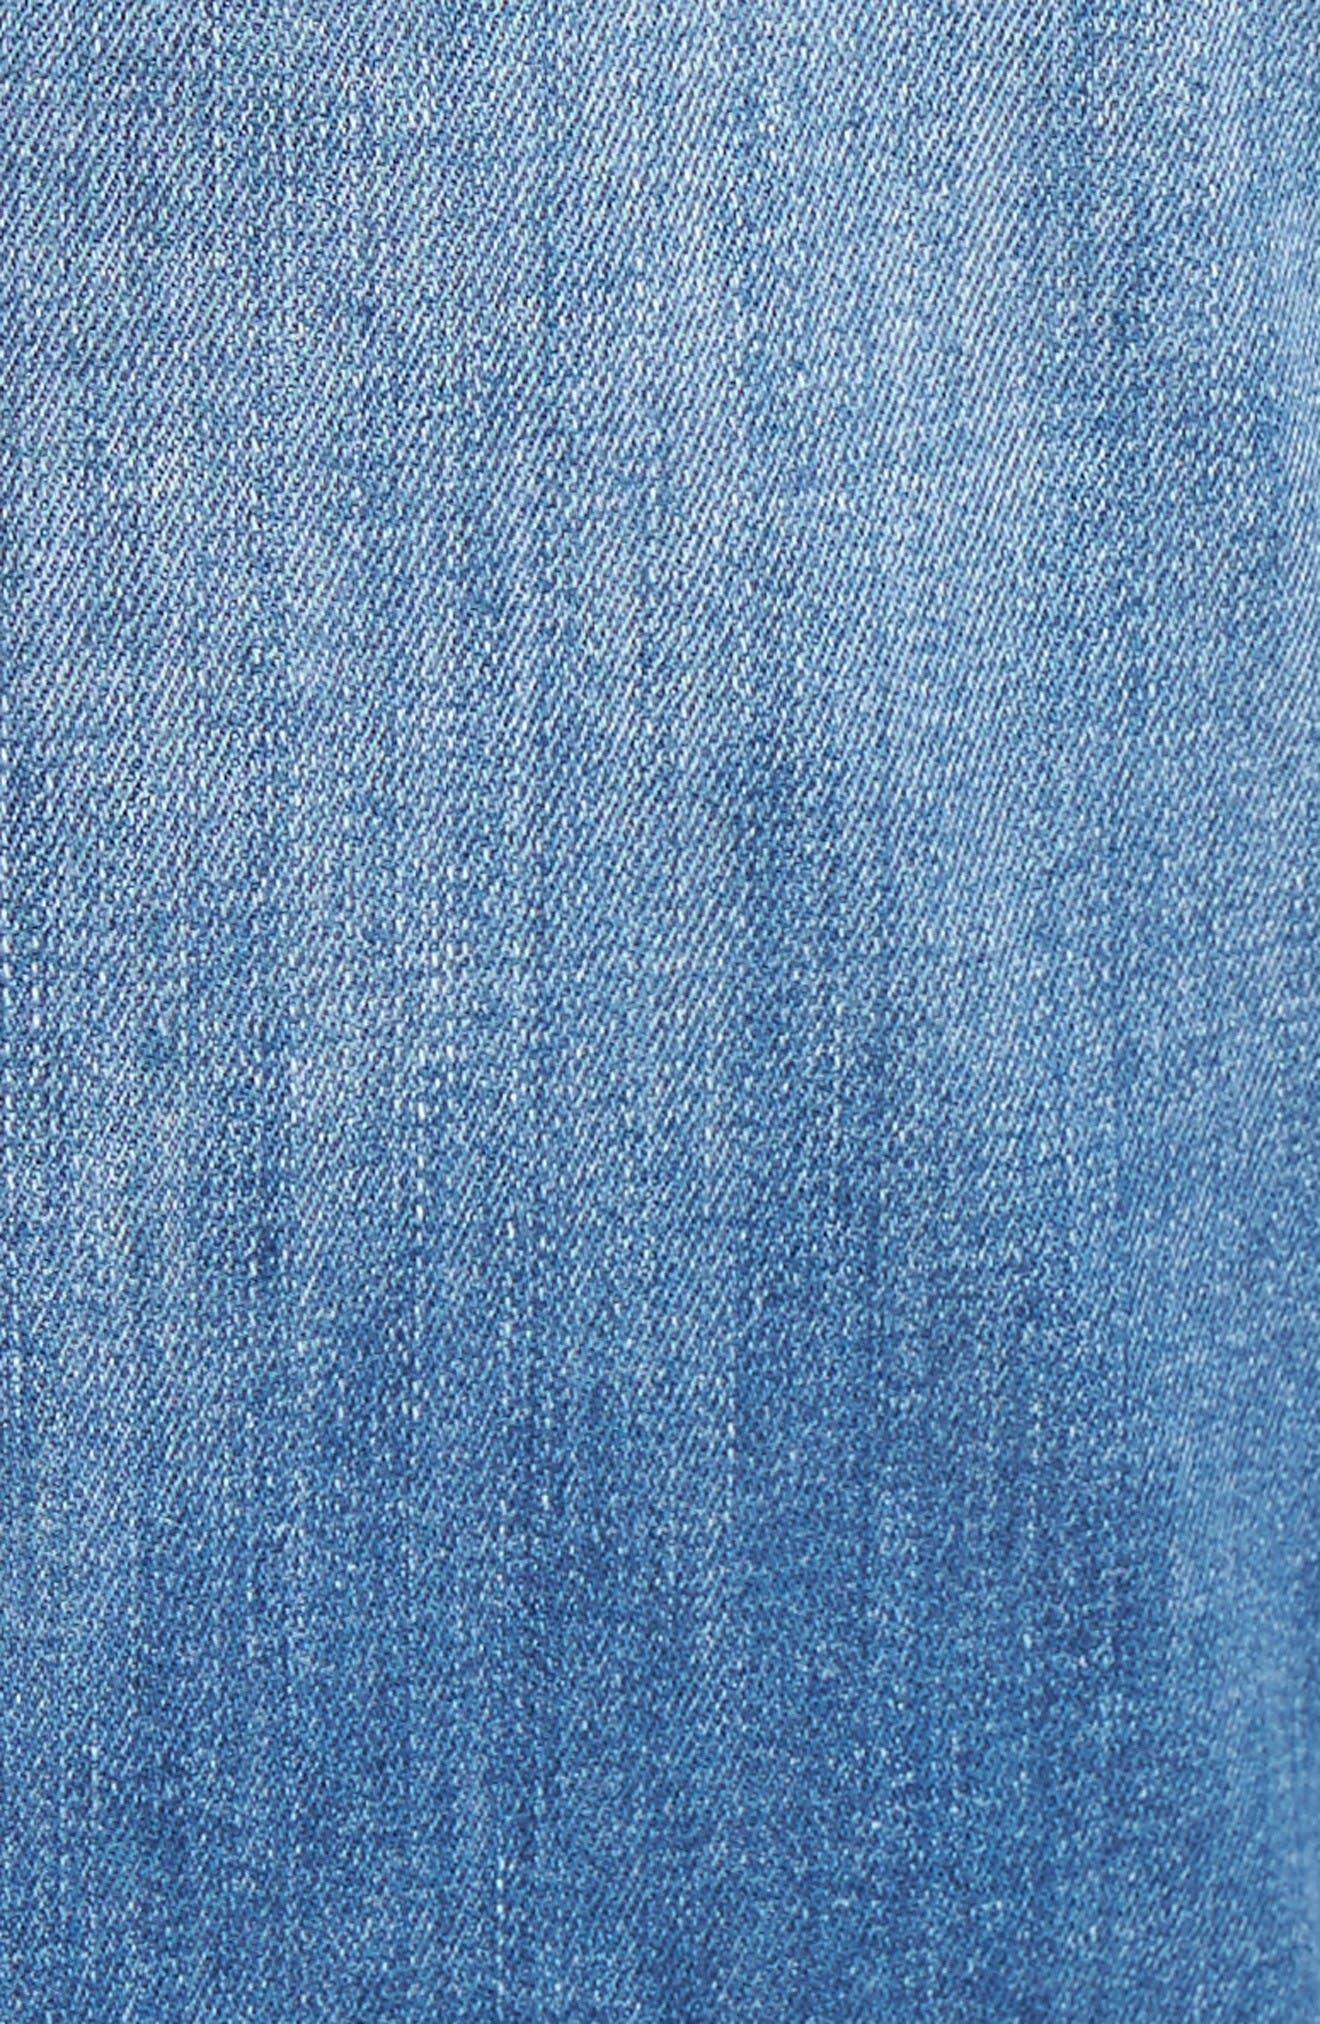 Myles Straight Leg Jeans,                             Alternate thumbnail 5, color,                             Mid Blue Portland